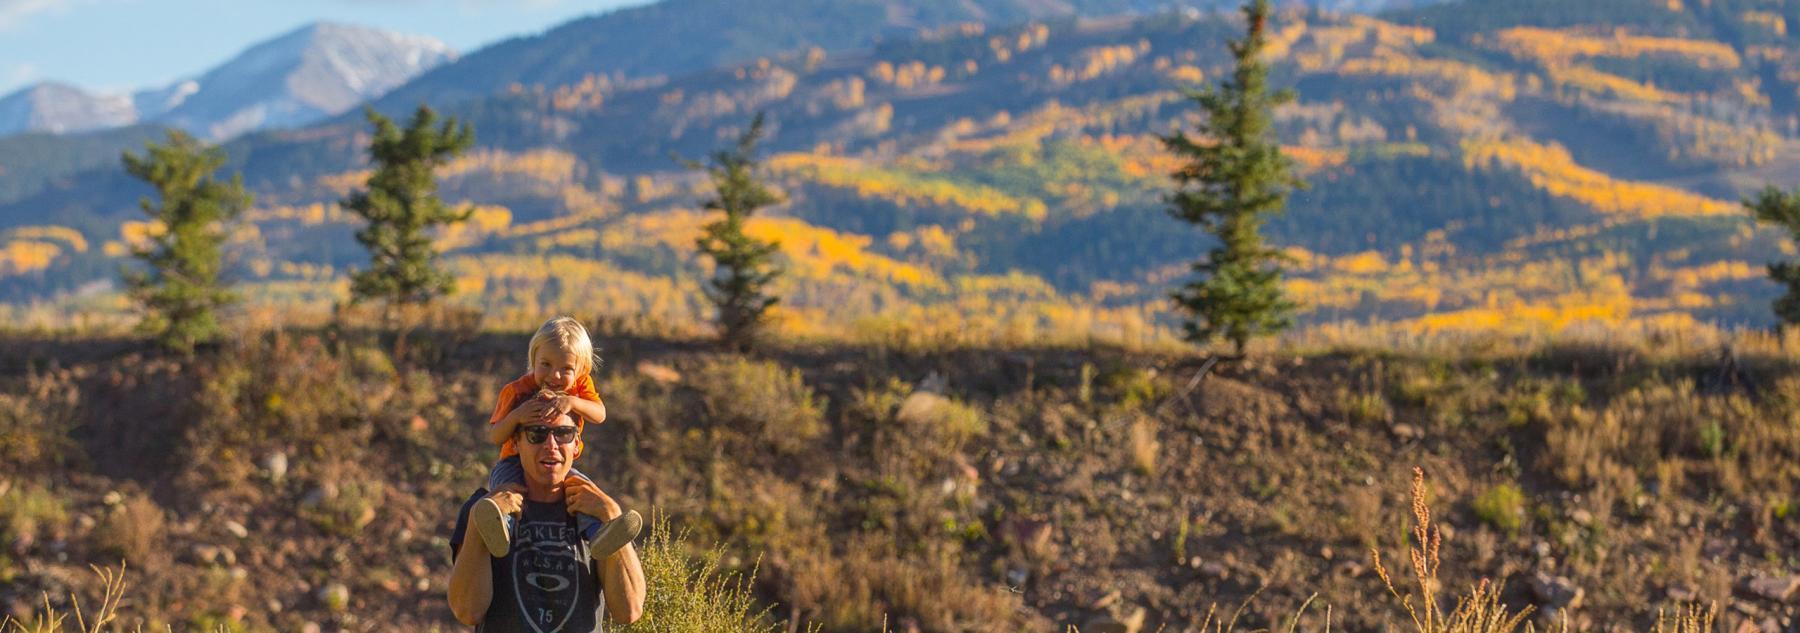 Aspen Hiking in the Fall